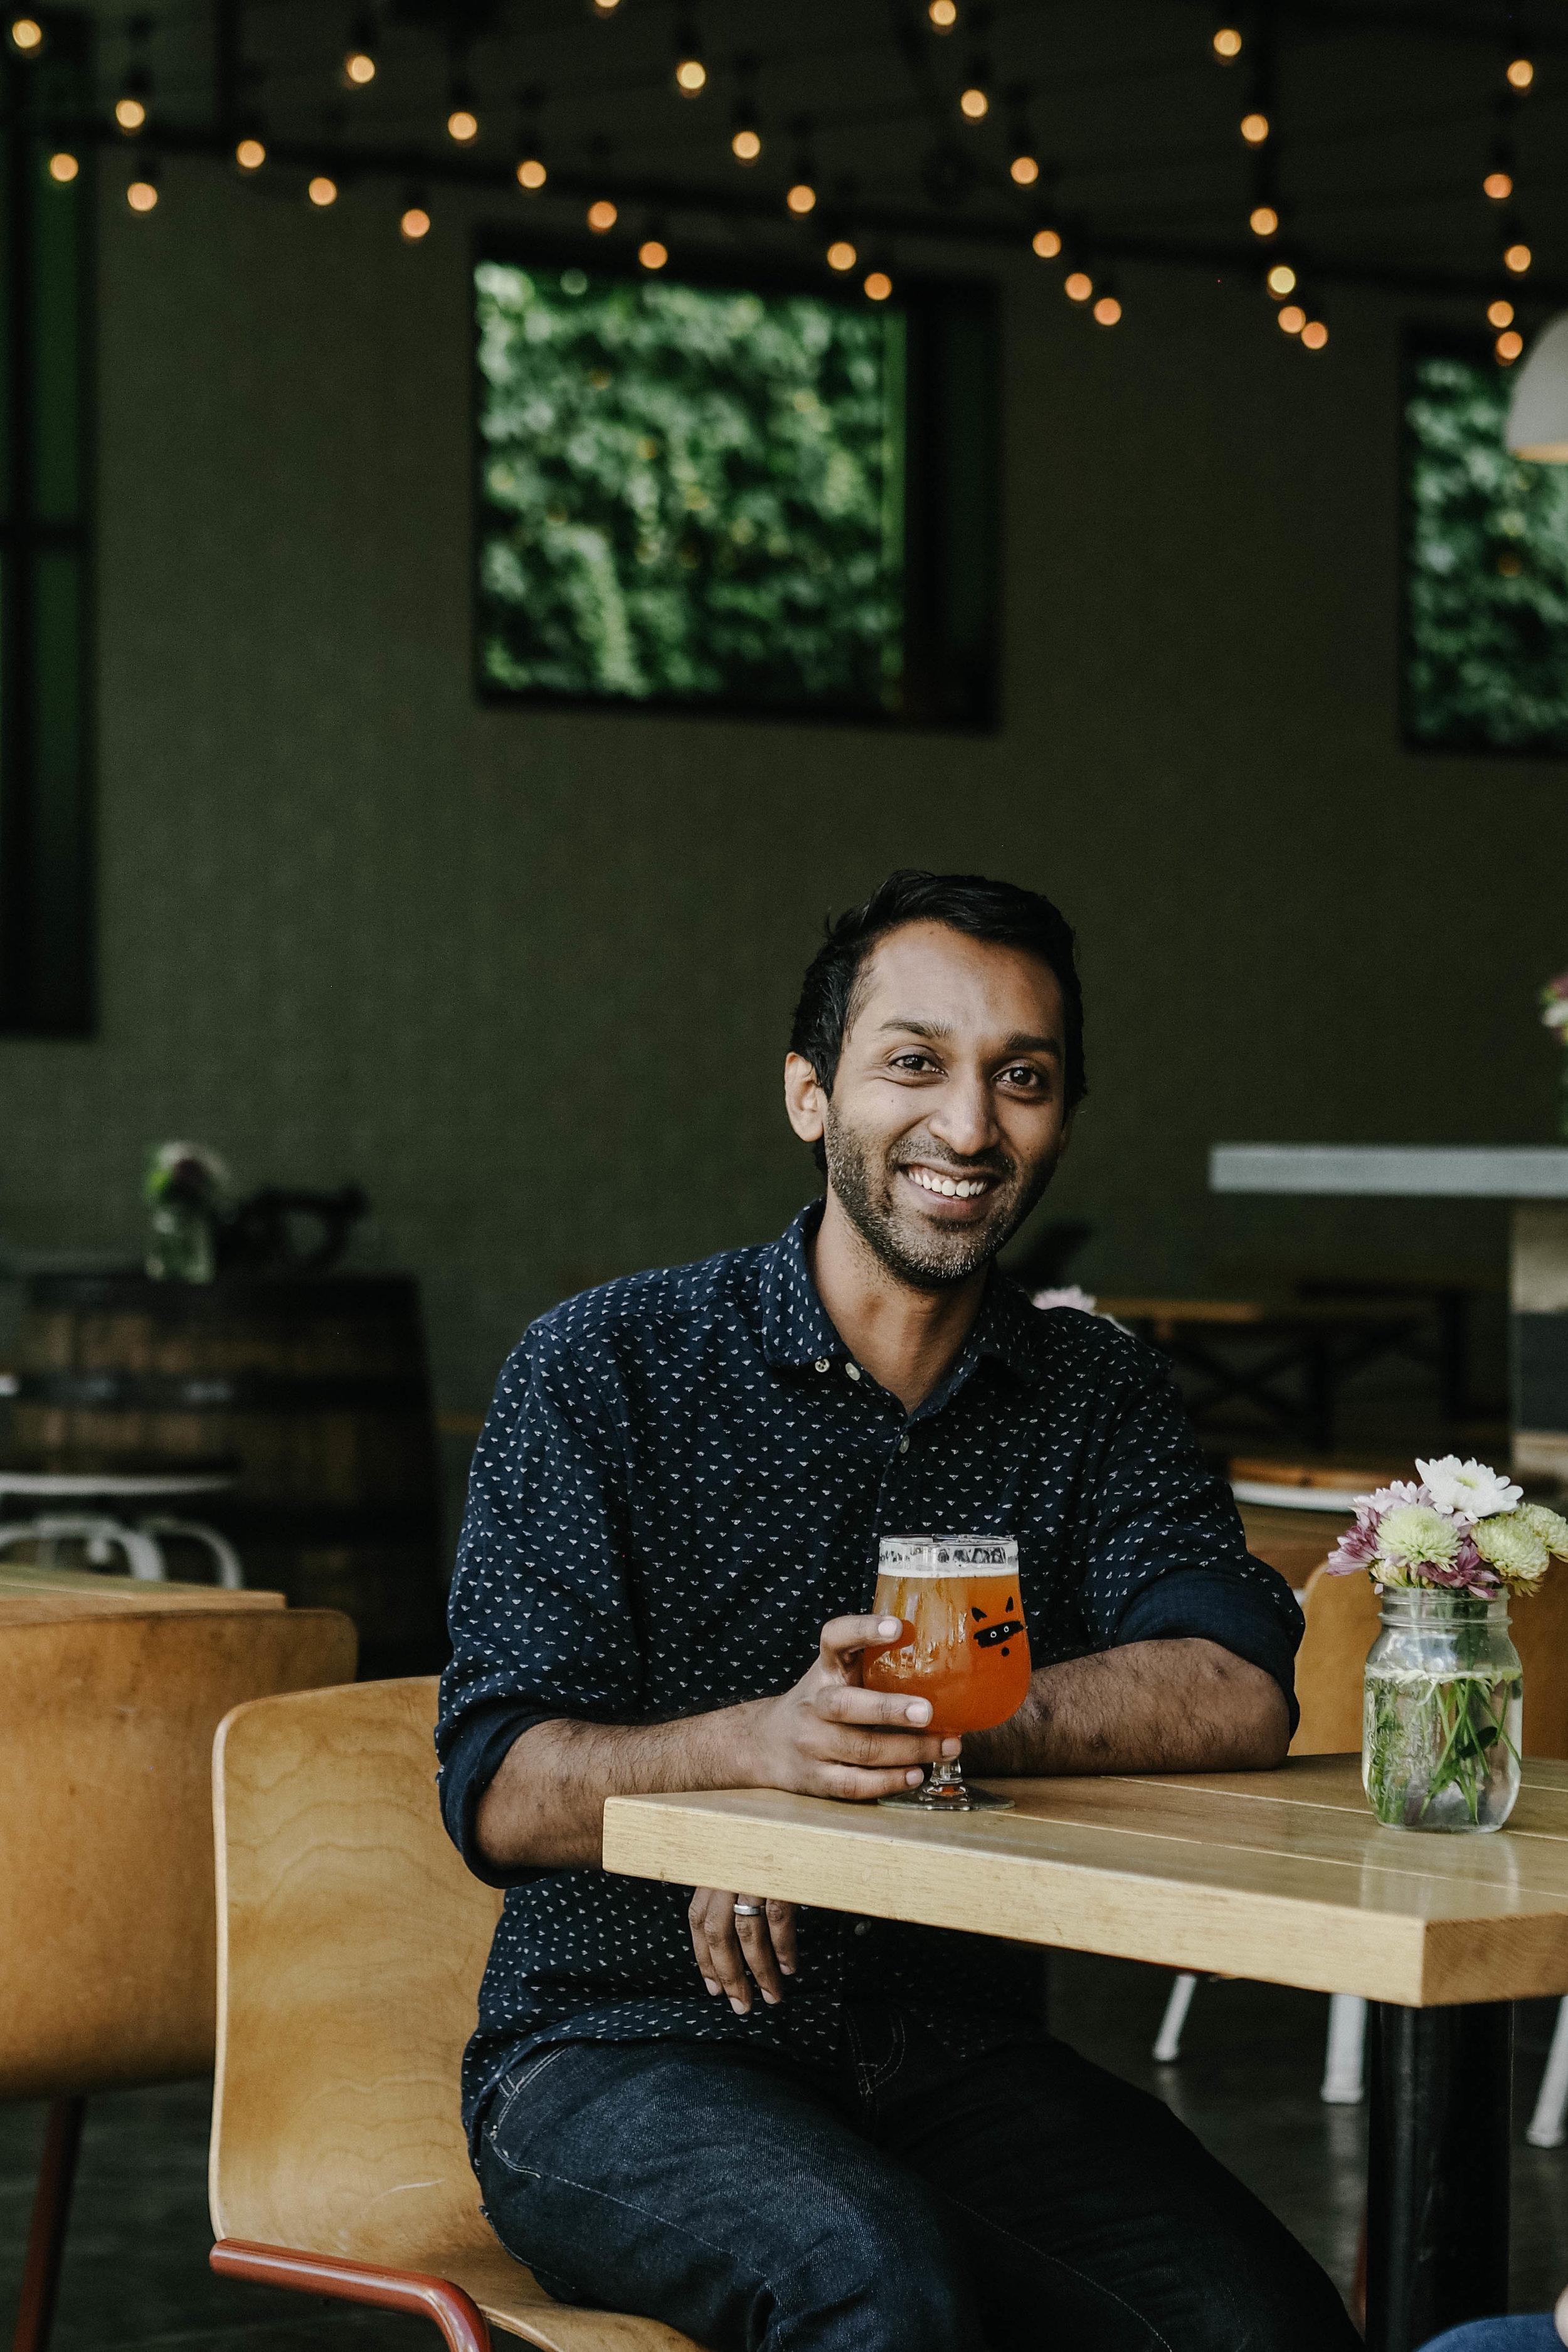 Shehzad Hamza bandit brewery